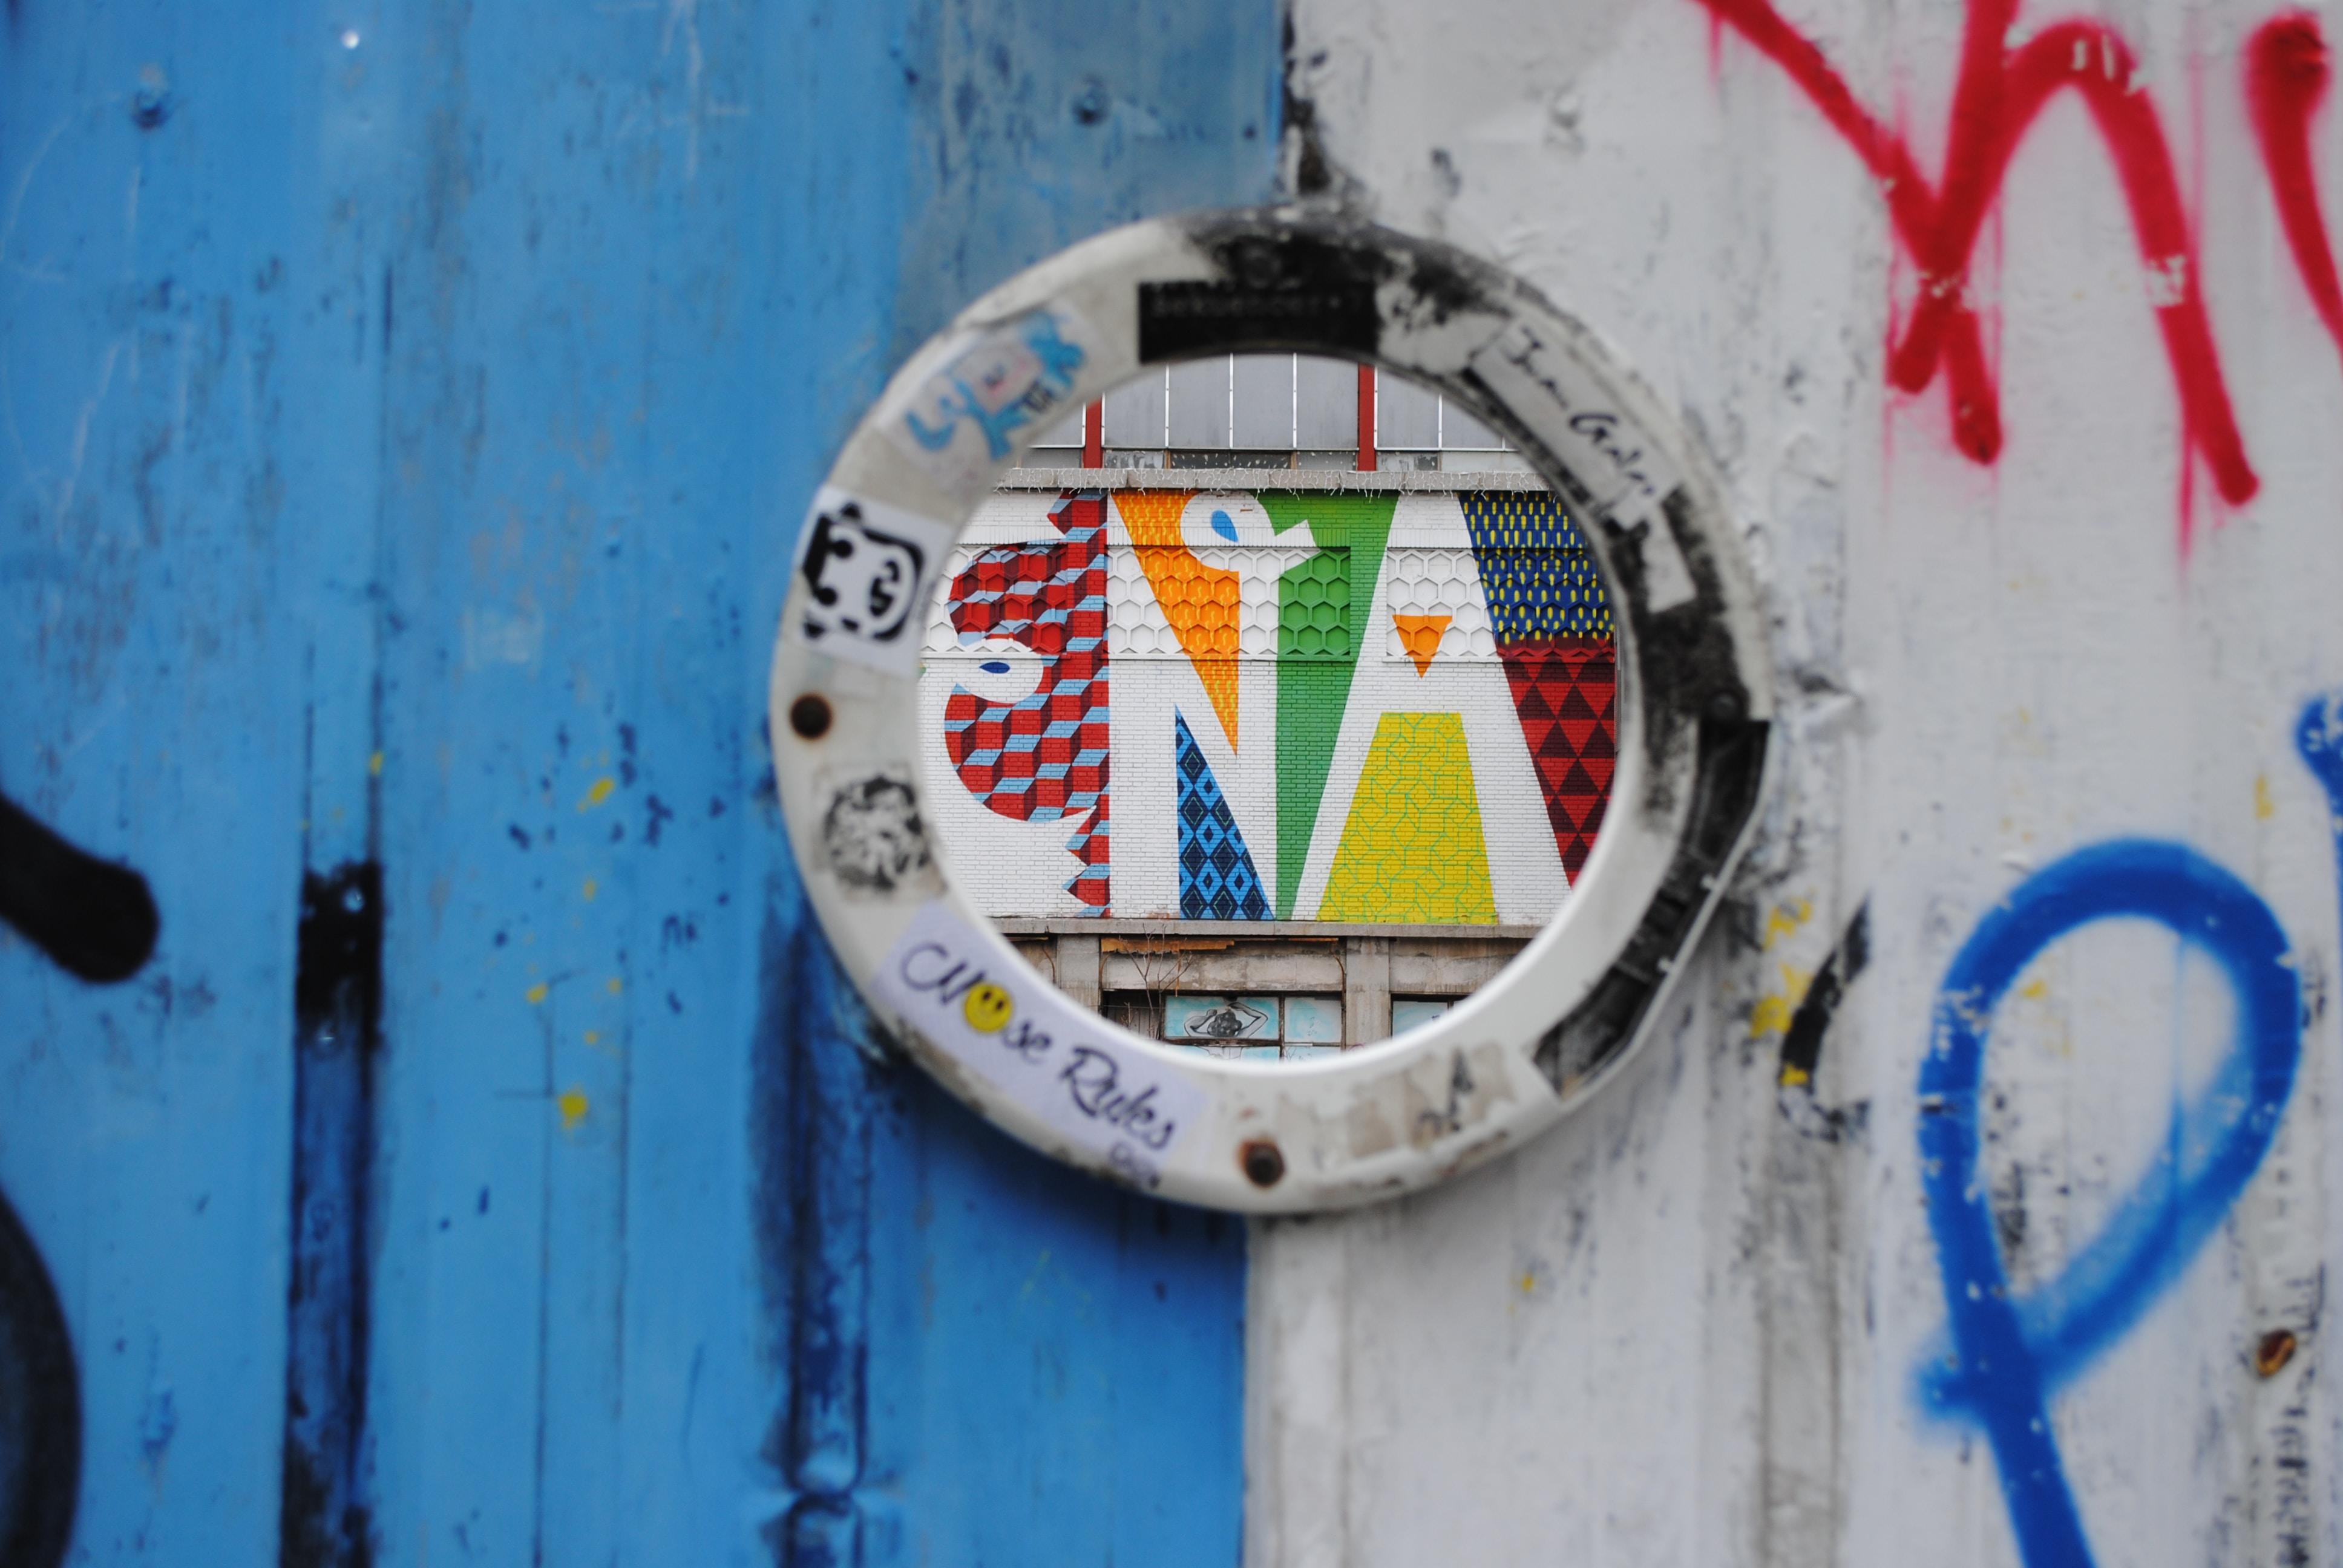 Colorful graffiti typography in round window surrounded by graffiti tags at Mercado de la Cebada